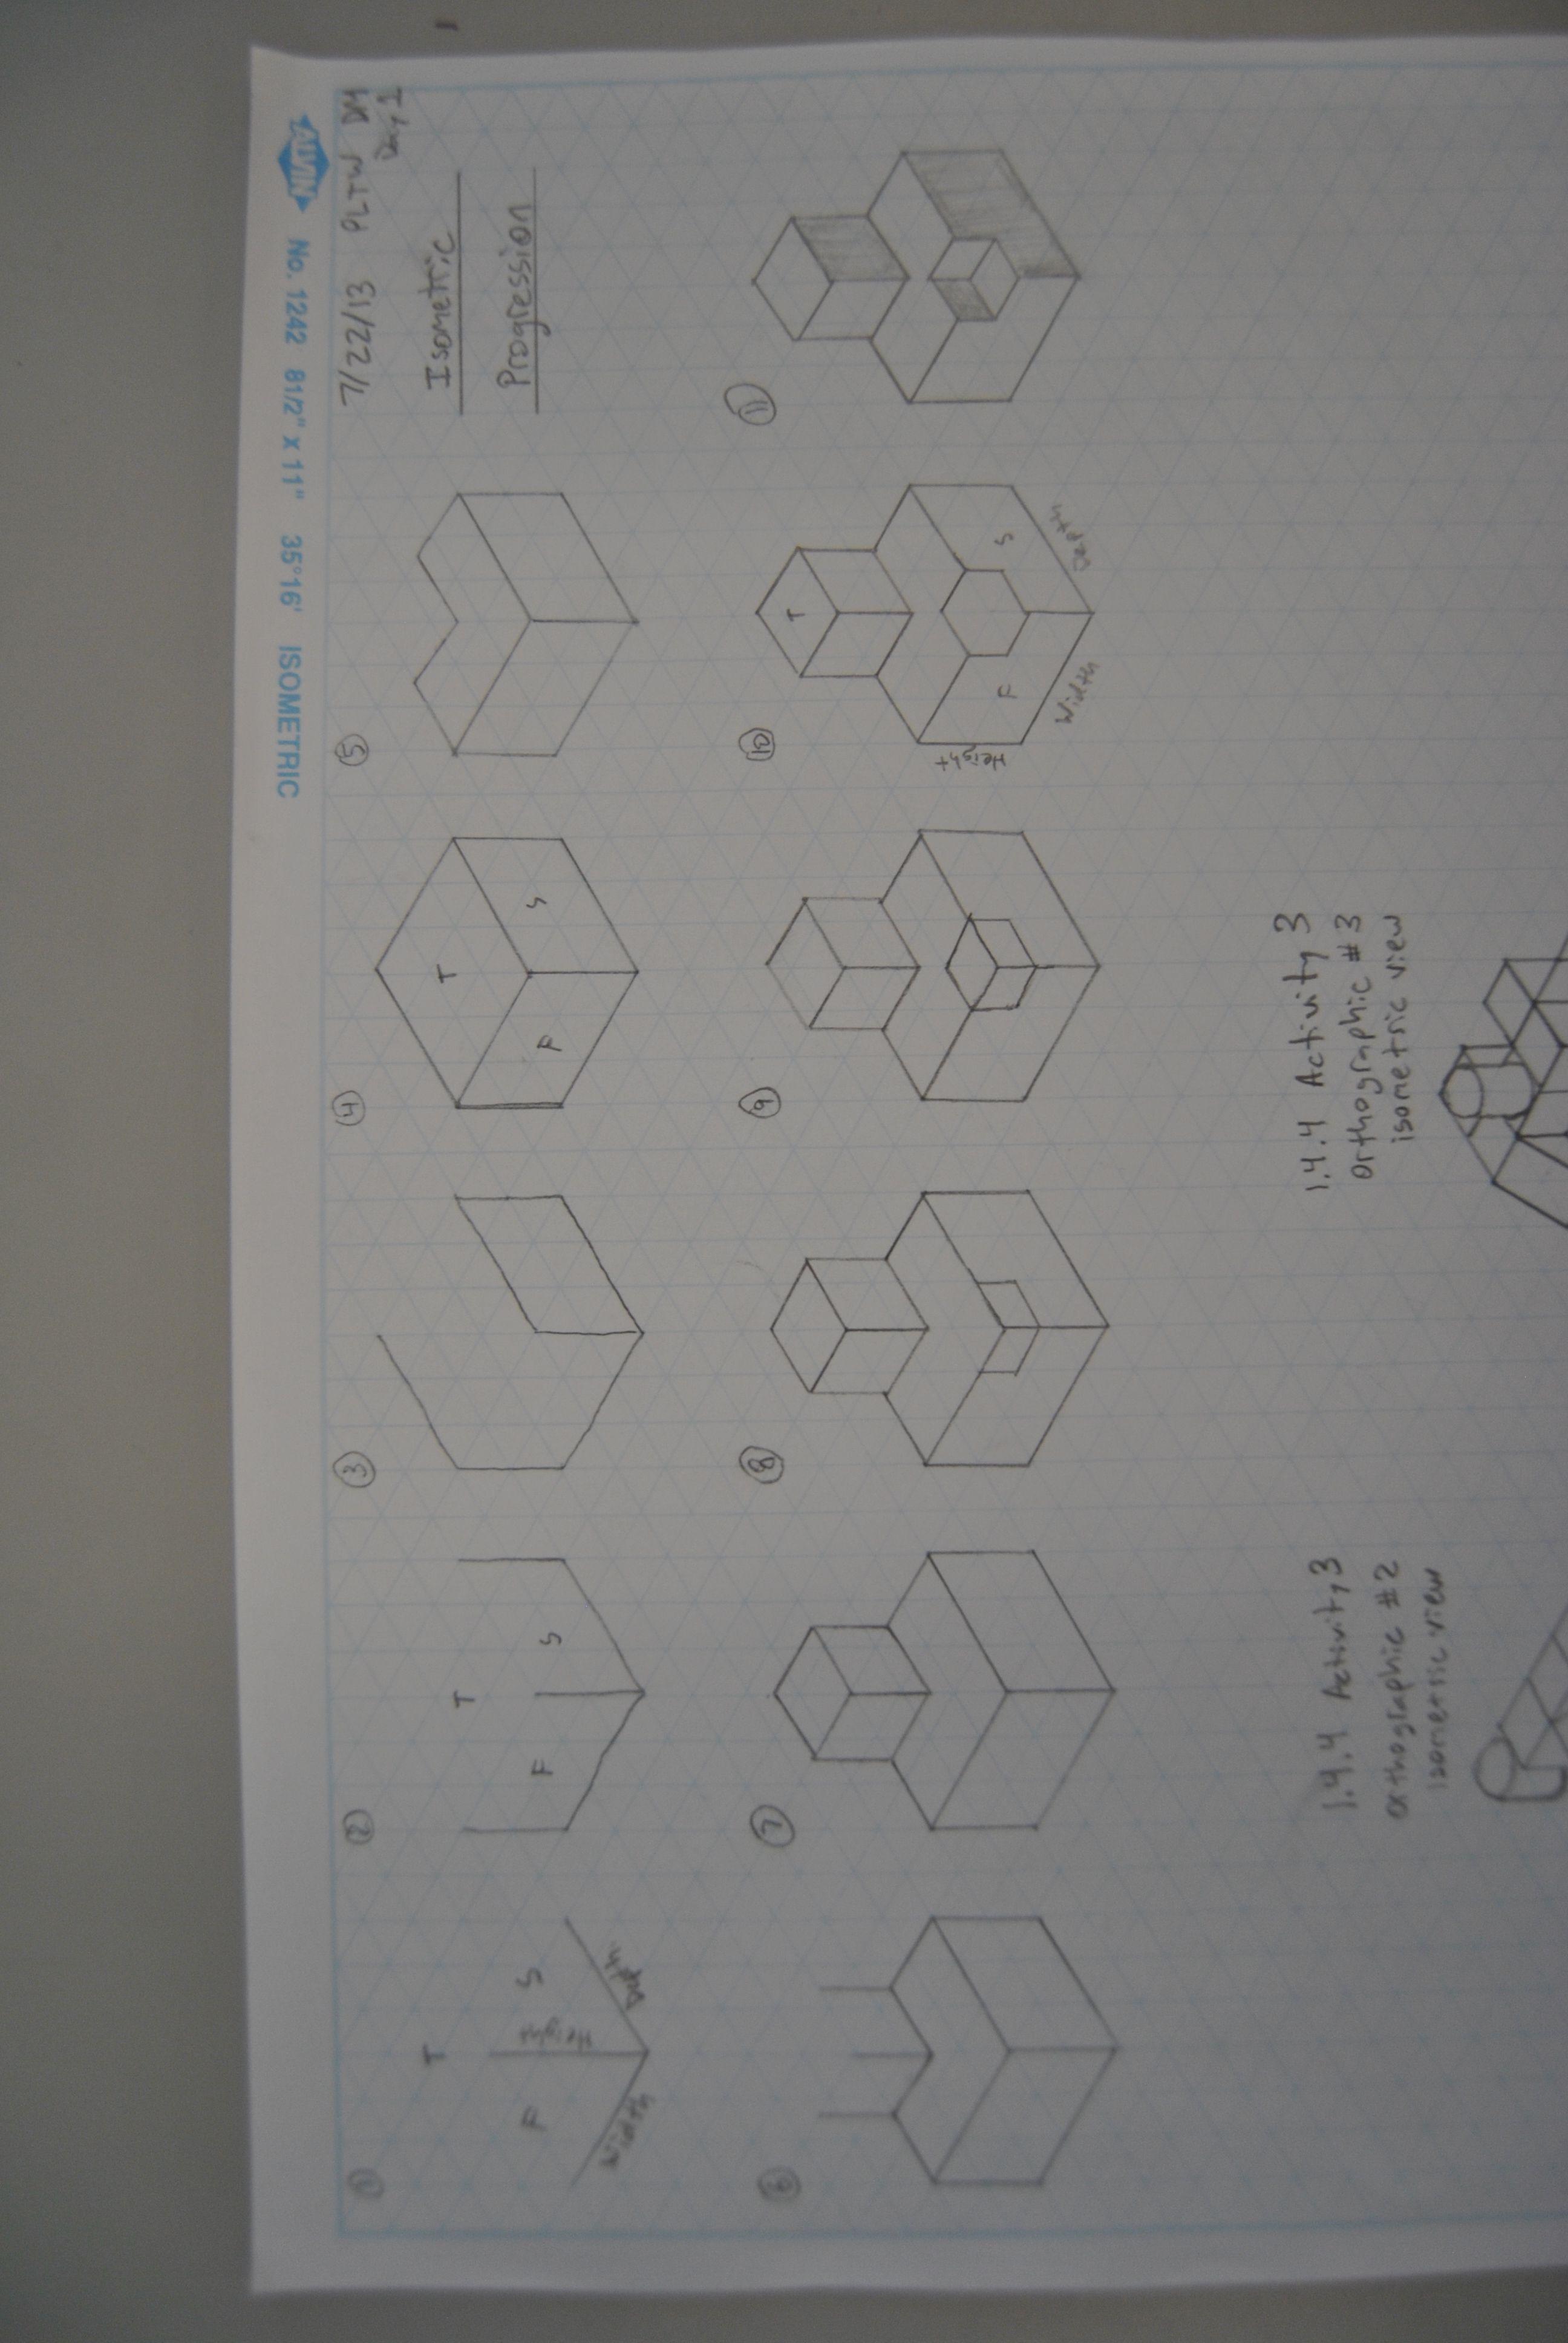 Design Amp Modeling Isometric Cube Progressions